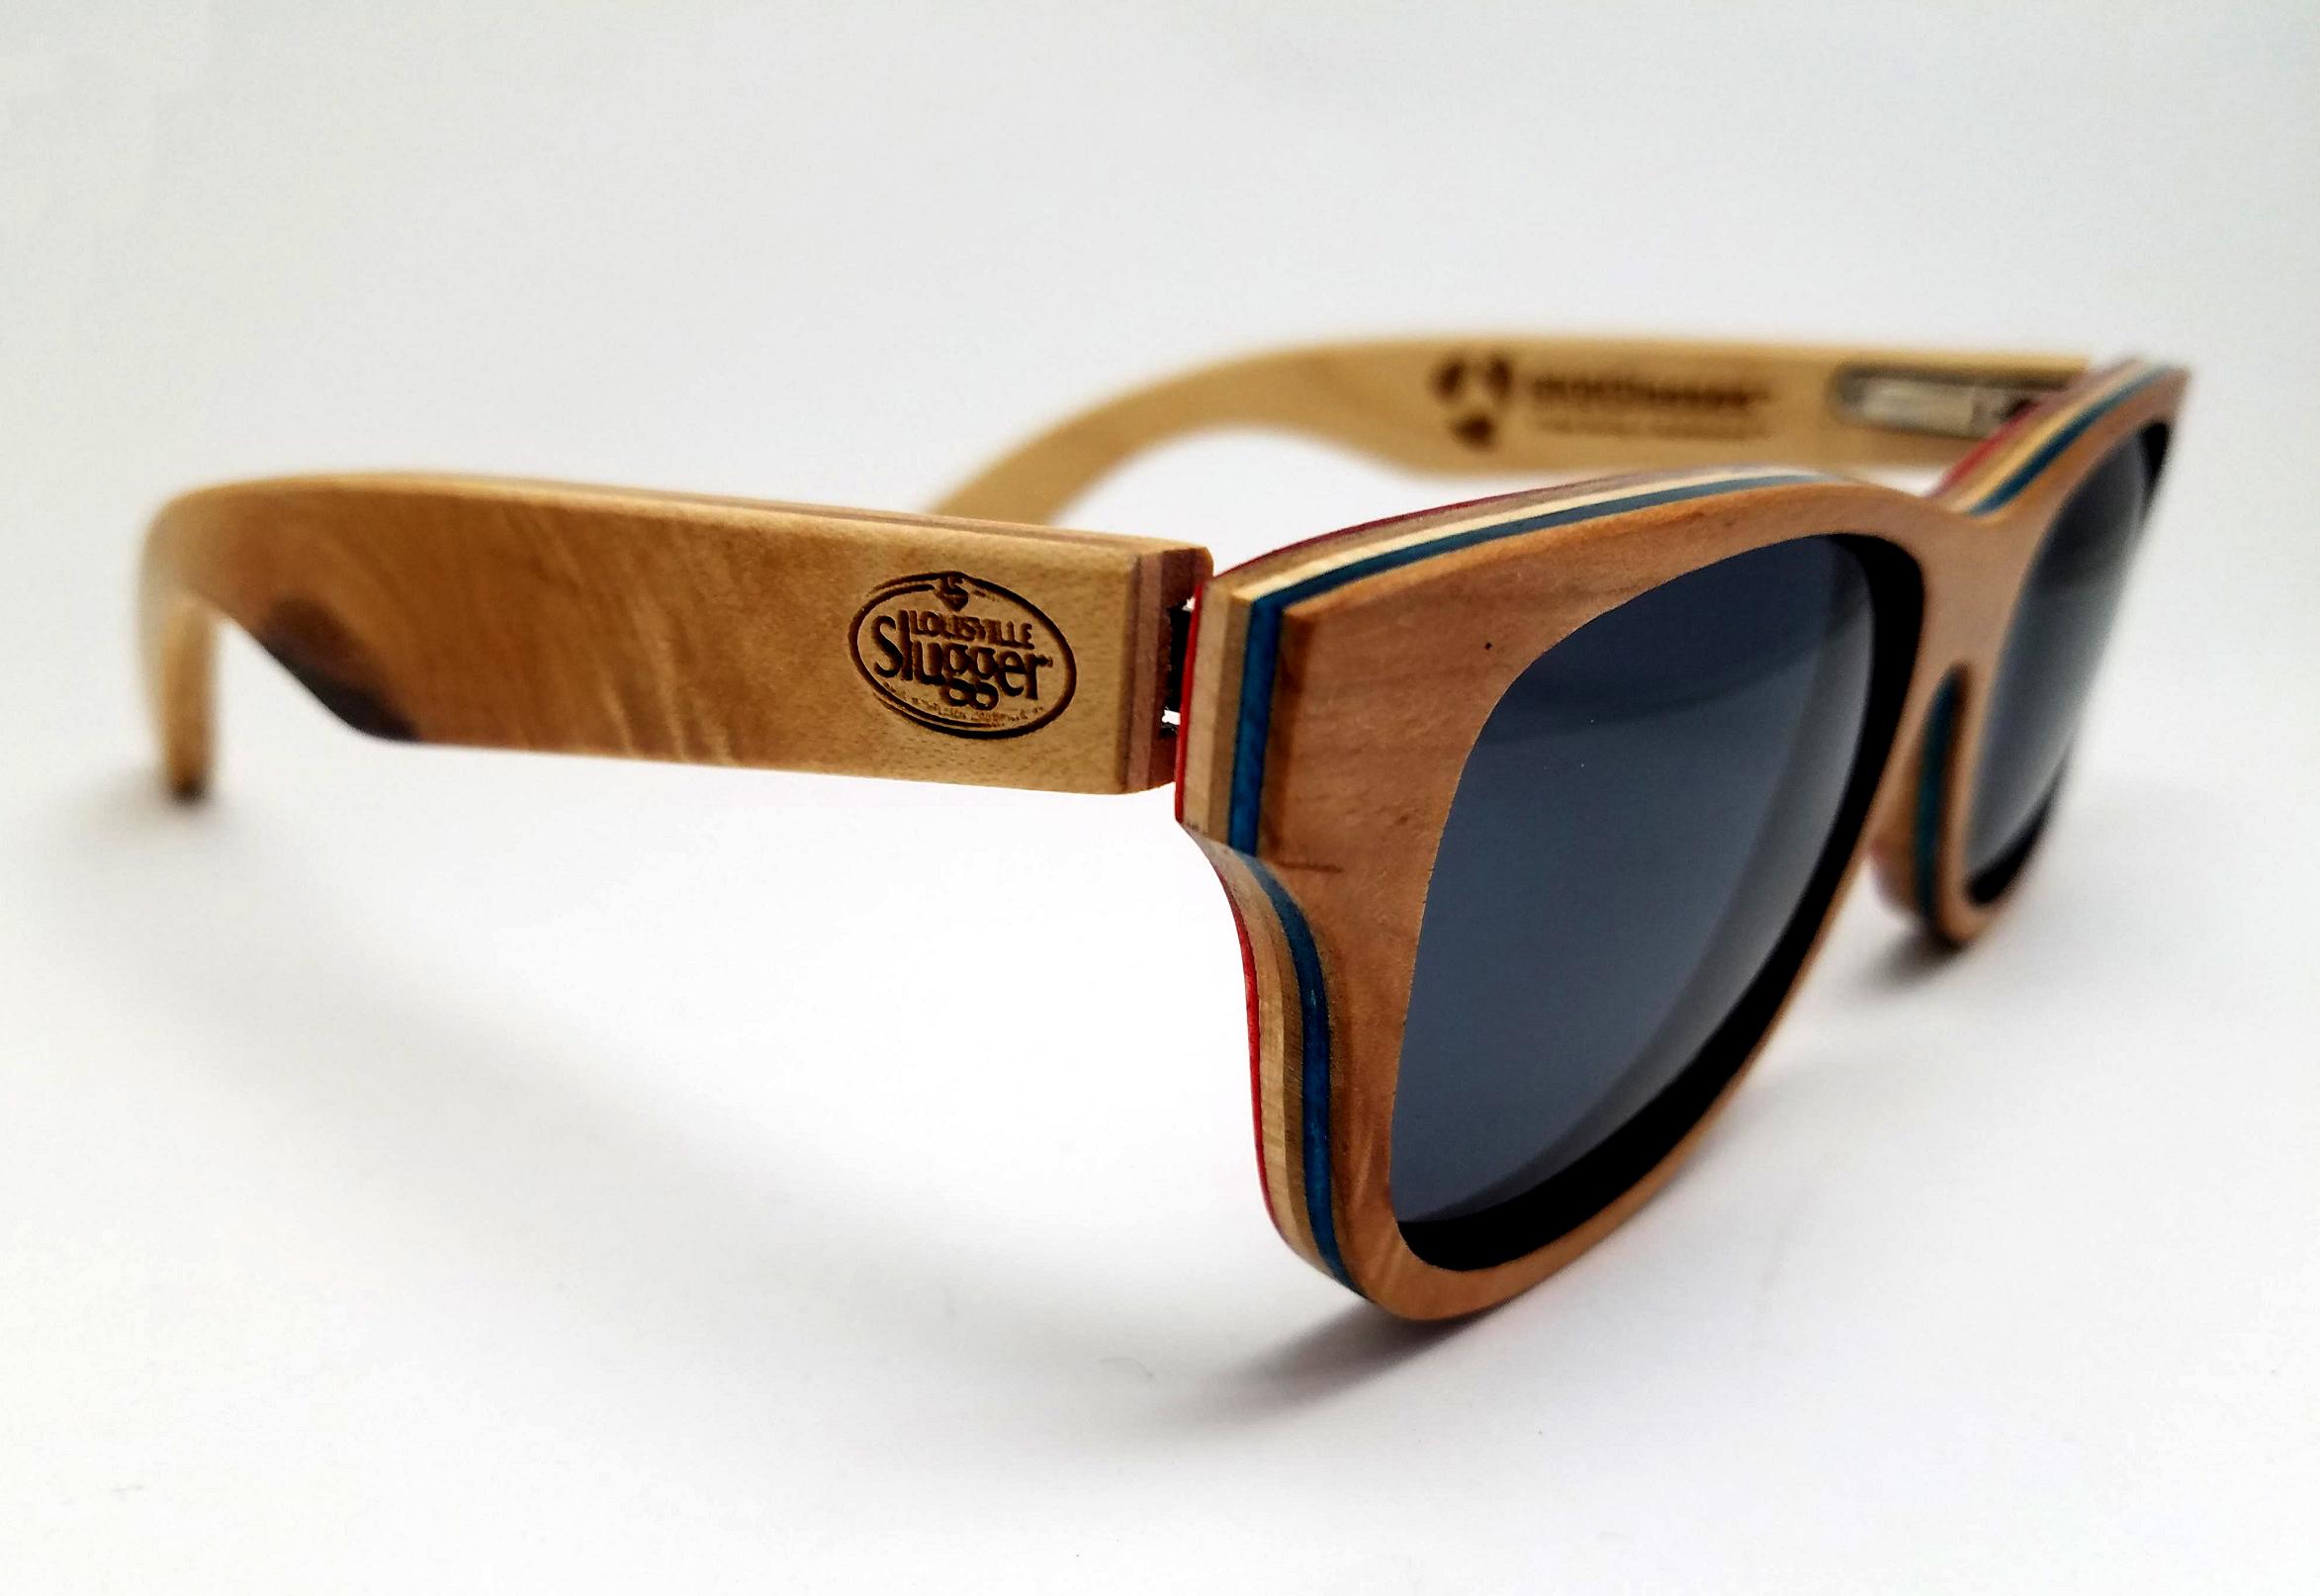 Sycamore SK8Glasses™ - Natural - Louisville Slugger - v1.jpg